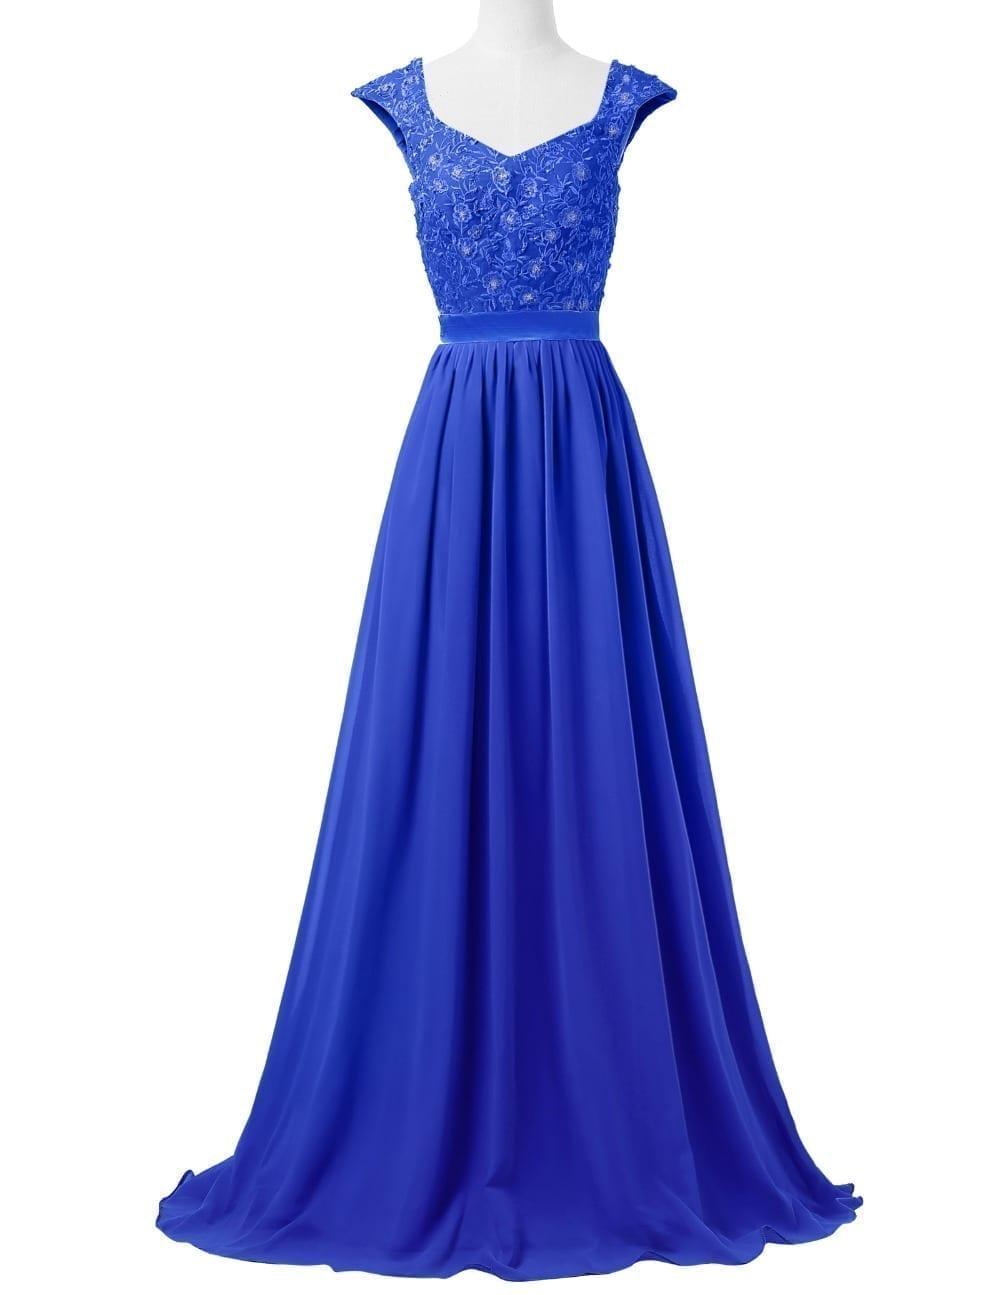 Sleeveless Lace Chiffon Long Formal Bridesmaid Dress